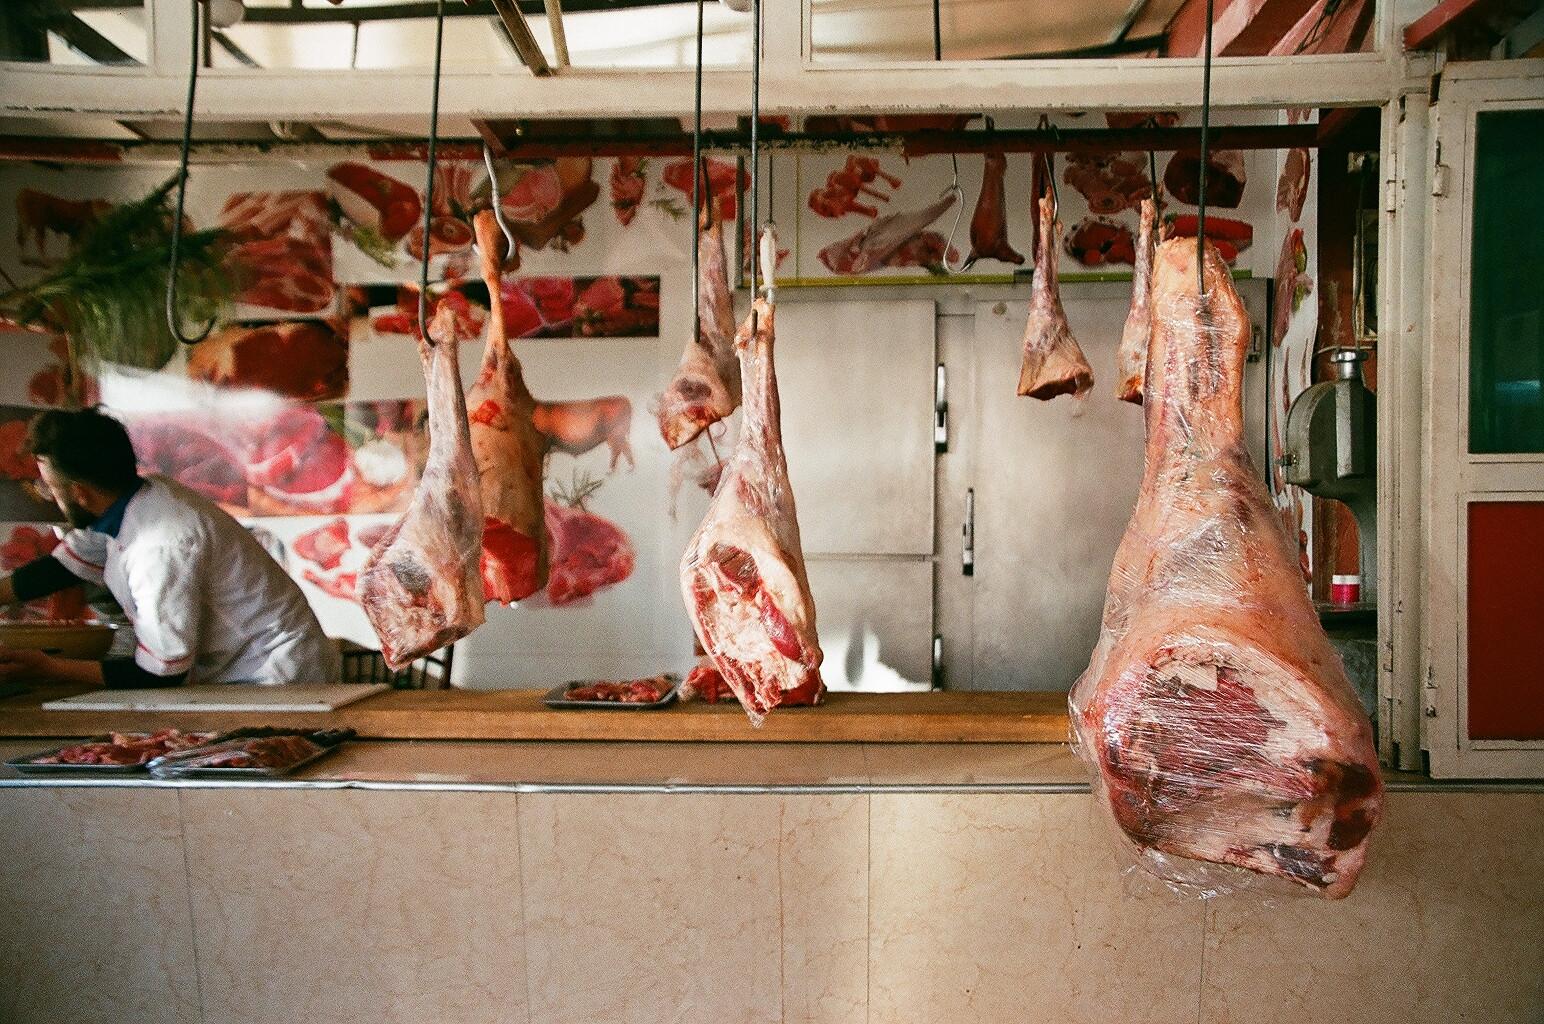 Moroccan meats